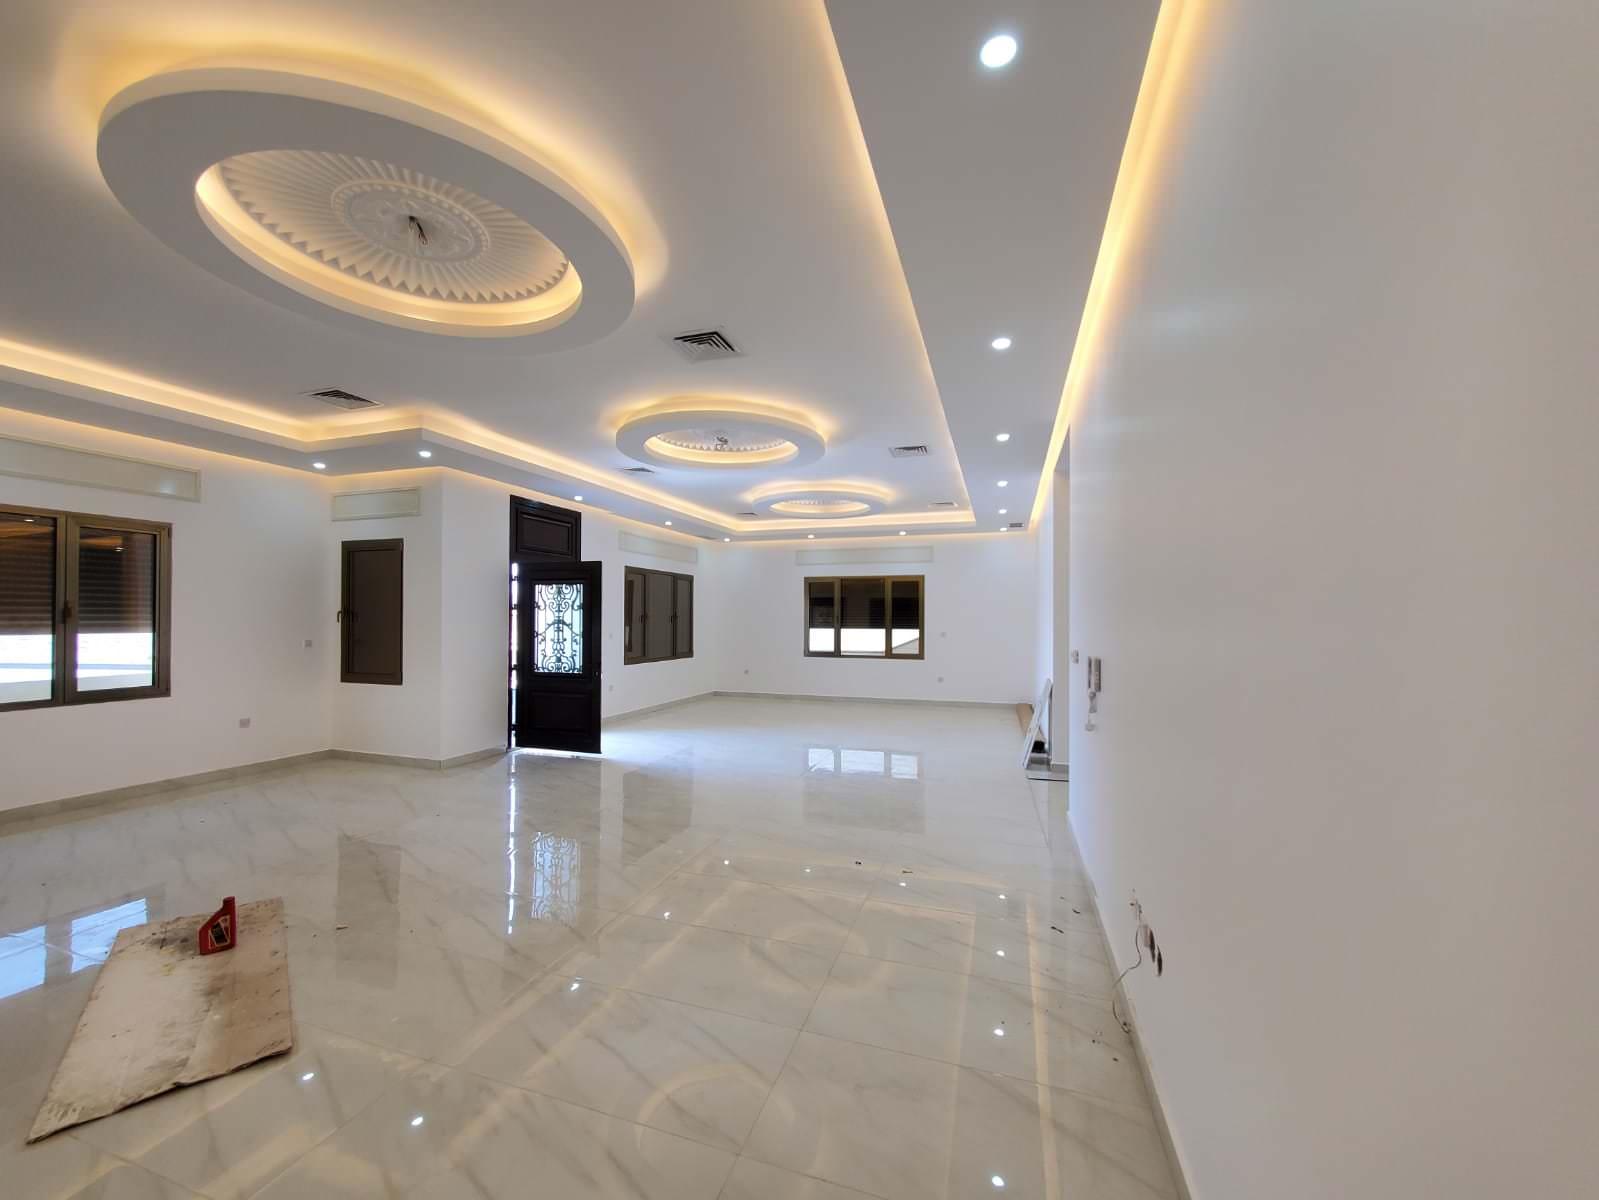 Fnaitees – spacious, new, unfurnished ground floor